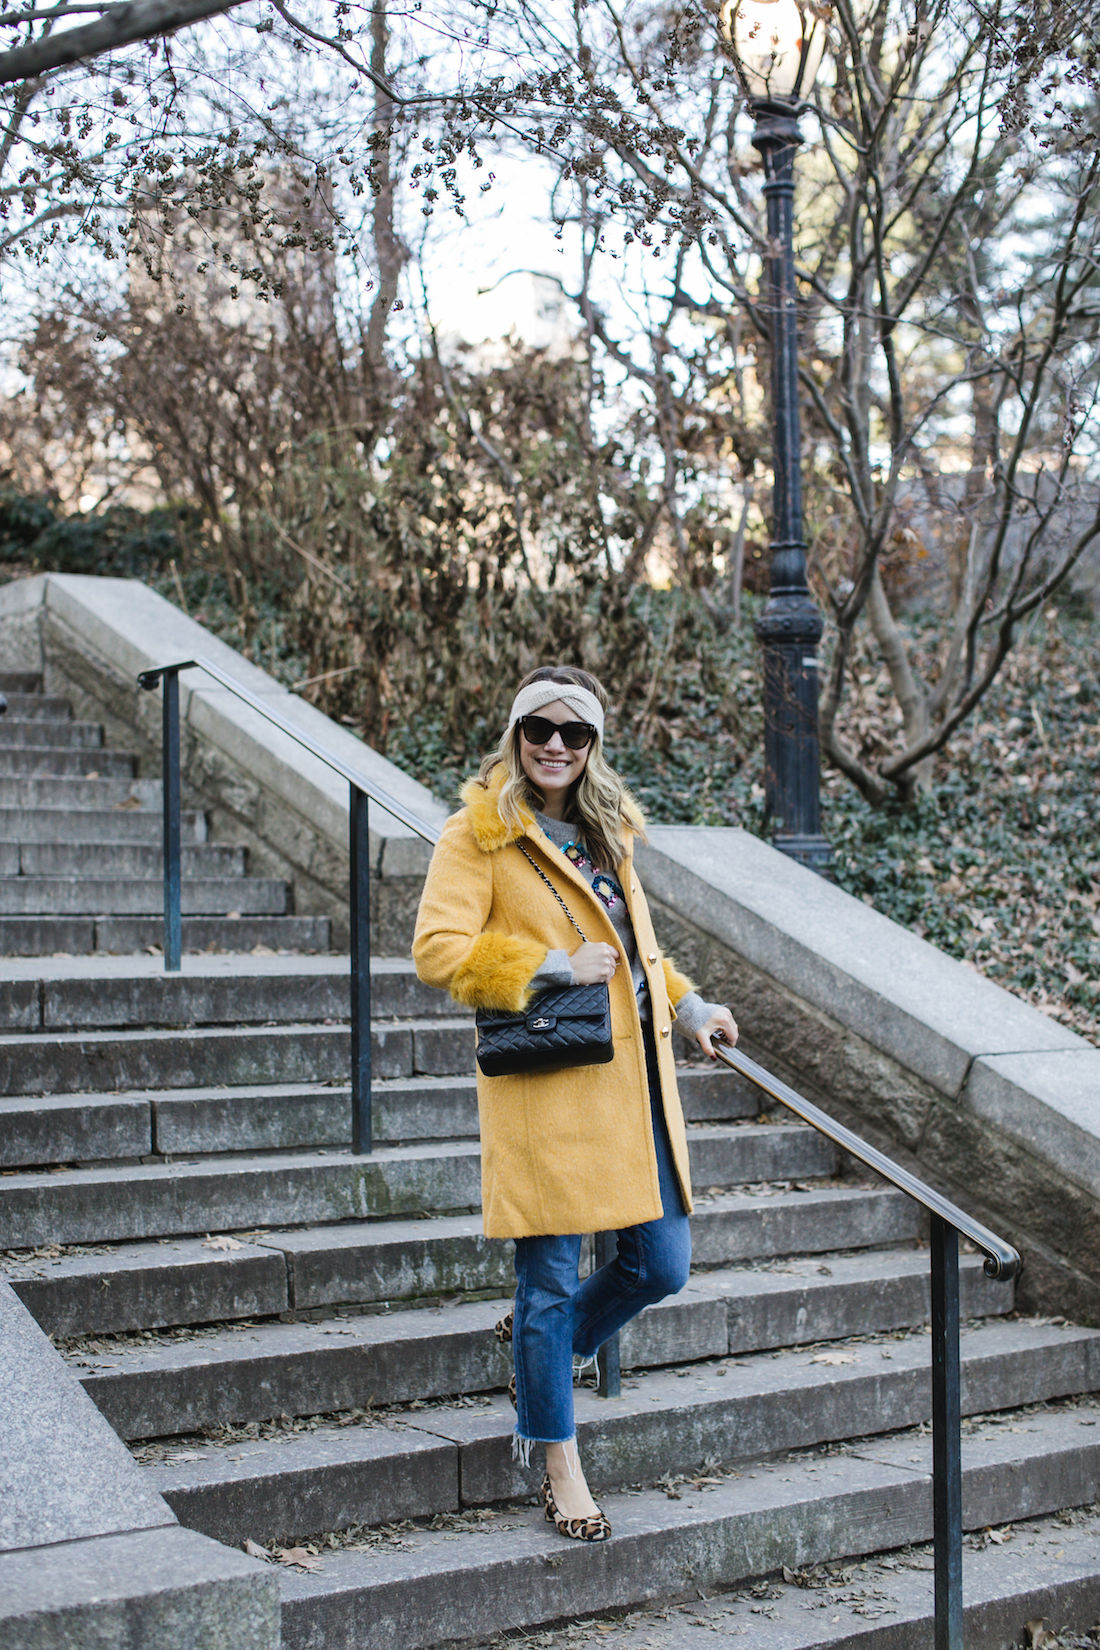 Kate Spade Coat // Zara Sweater // Re/Done Denim // Margaux Heels // Eileen Fisher Headband // Chanel Bag // Polaroid Sunglasses